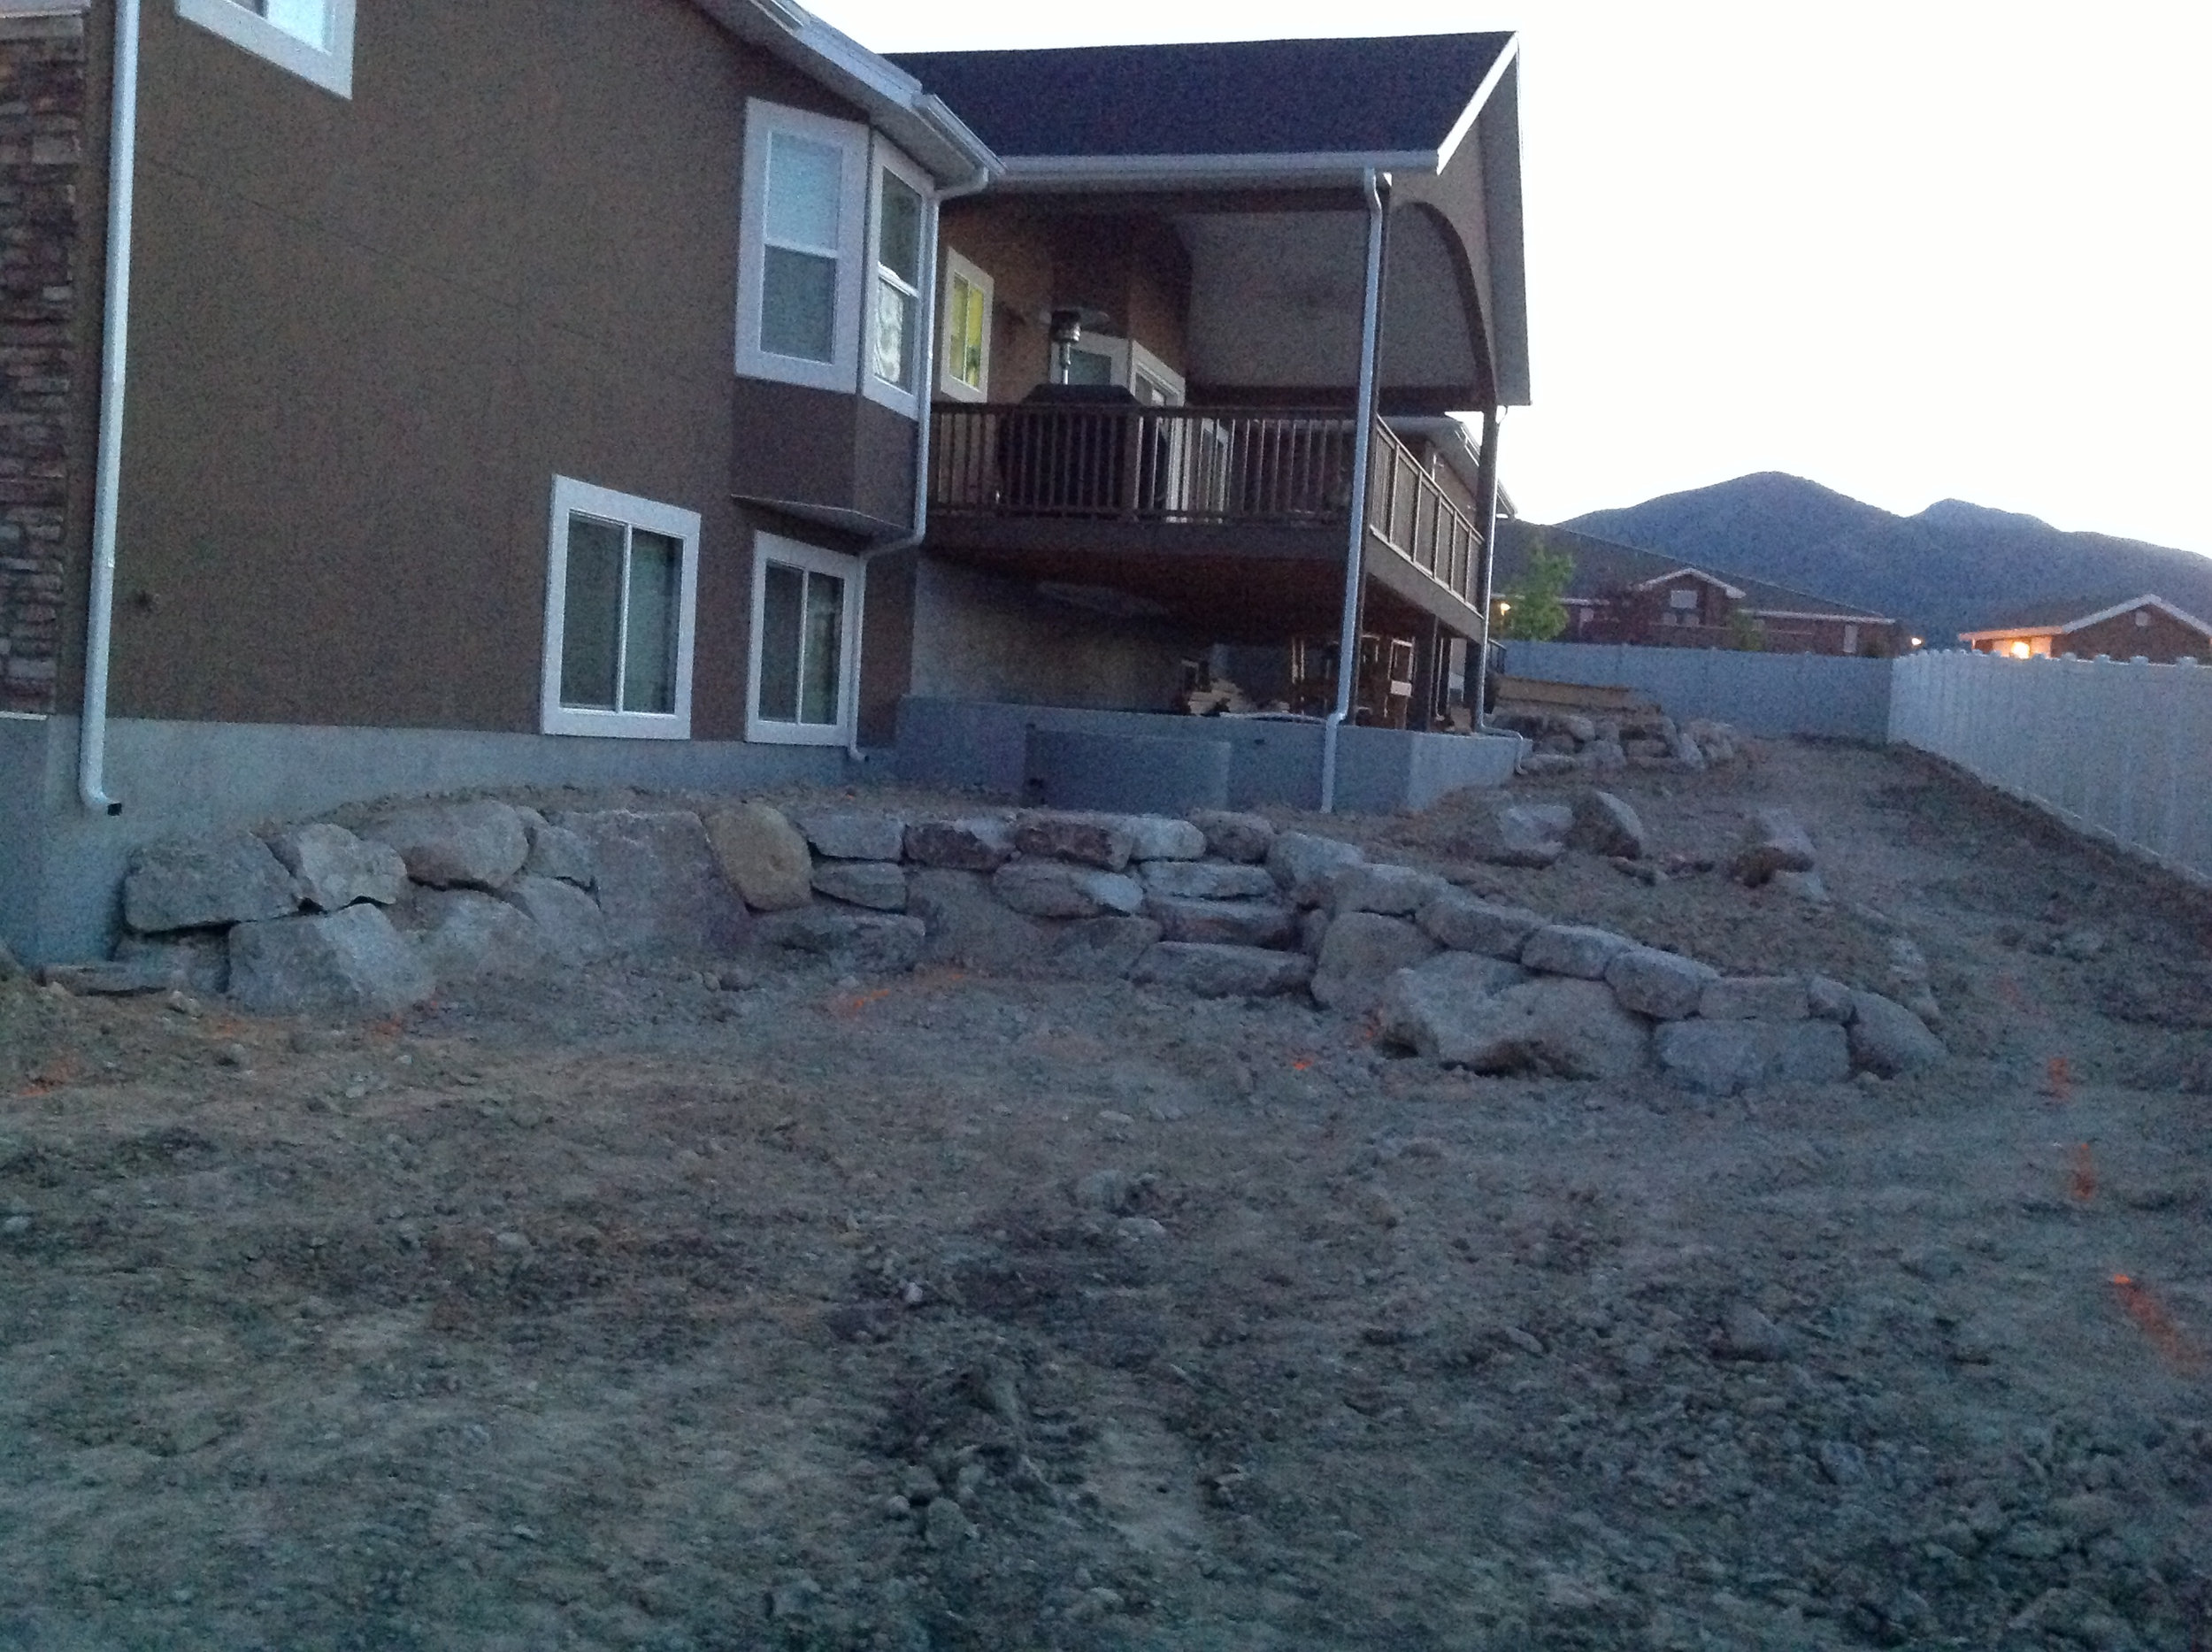 Rock Stairways - Stairways in either cut or natural rocks.